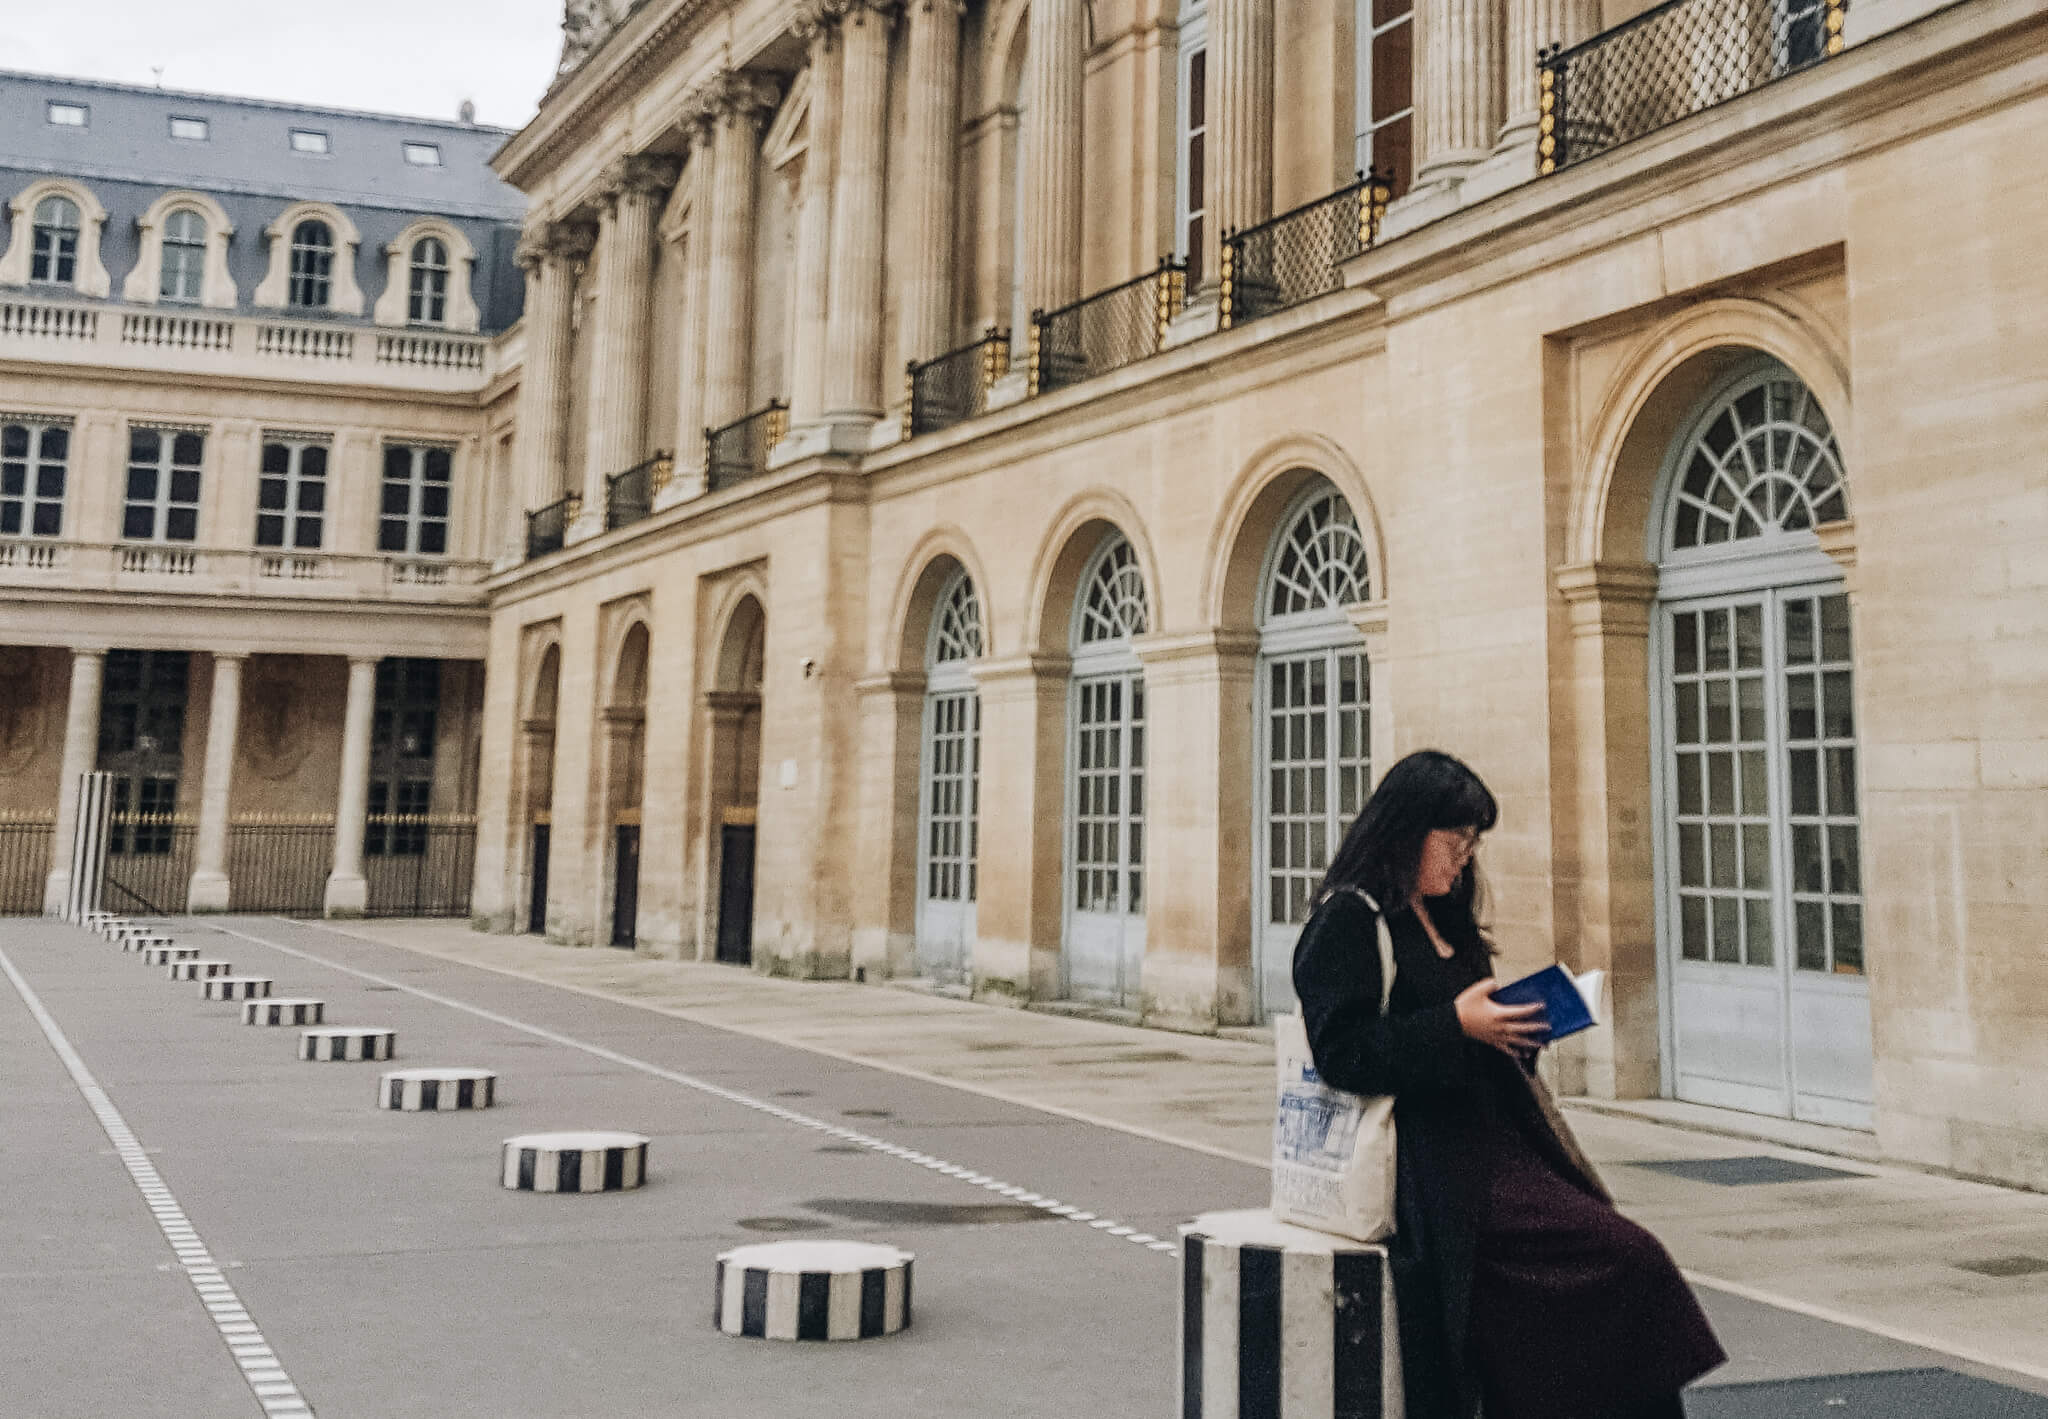 - Booklover in Paris - 出張のスキマ時間で楽しむ、フランス・パリで読書の秋。